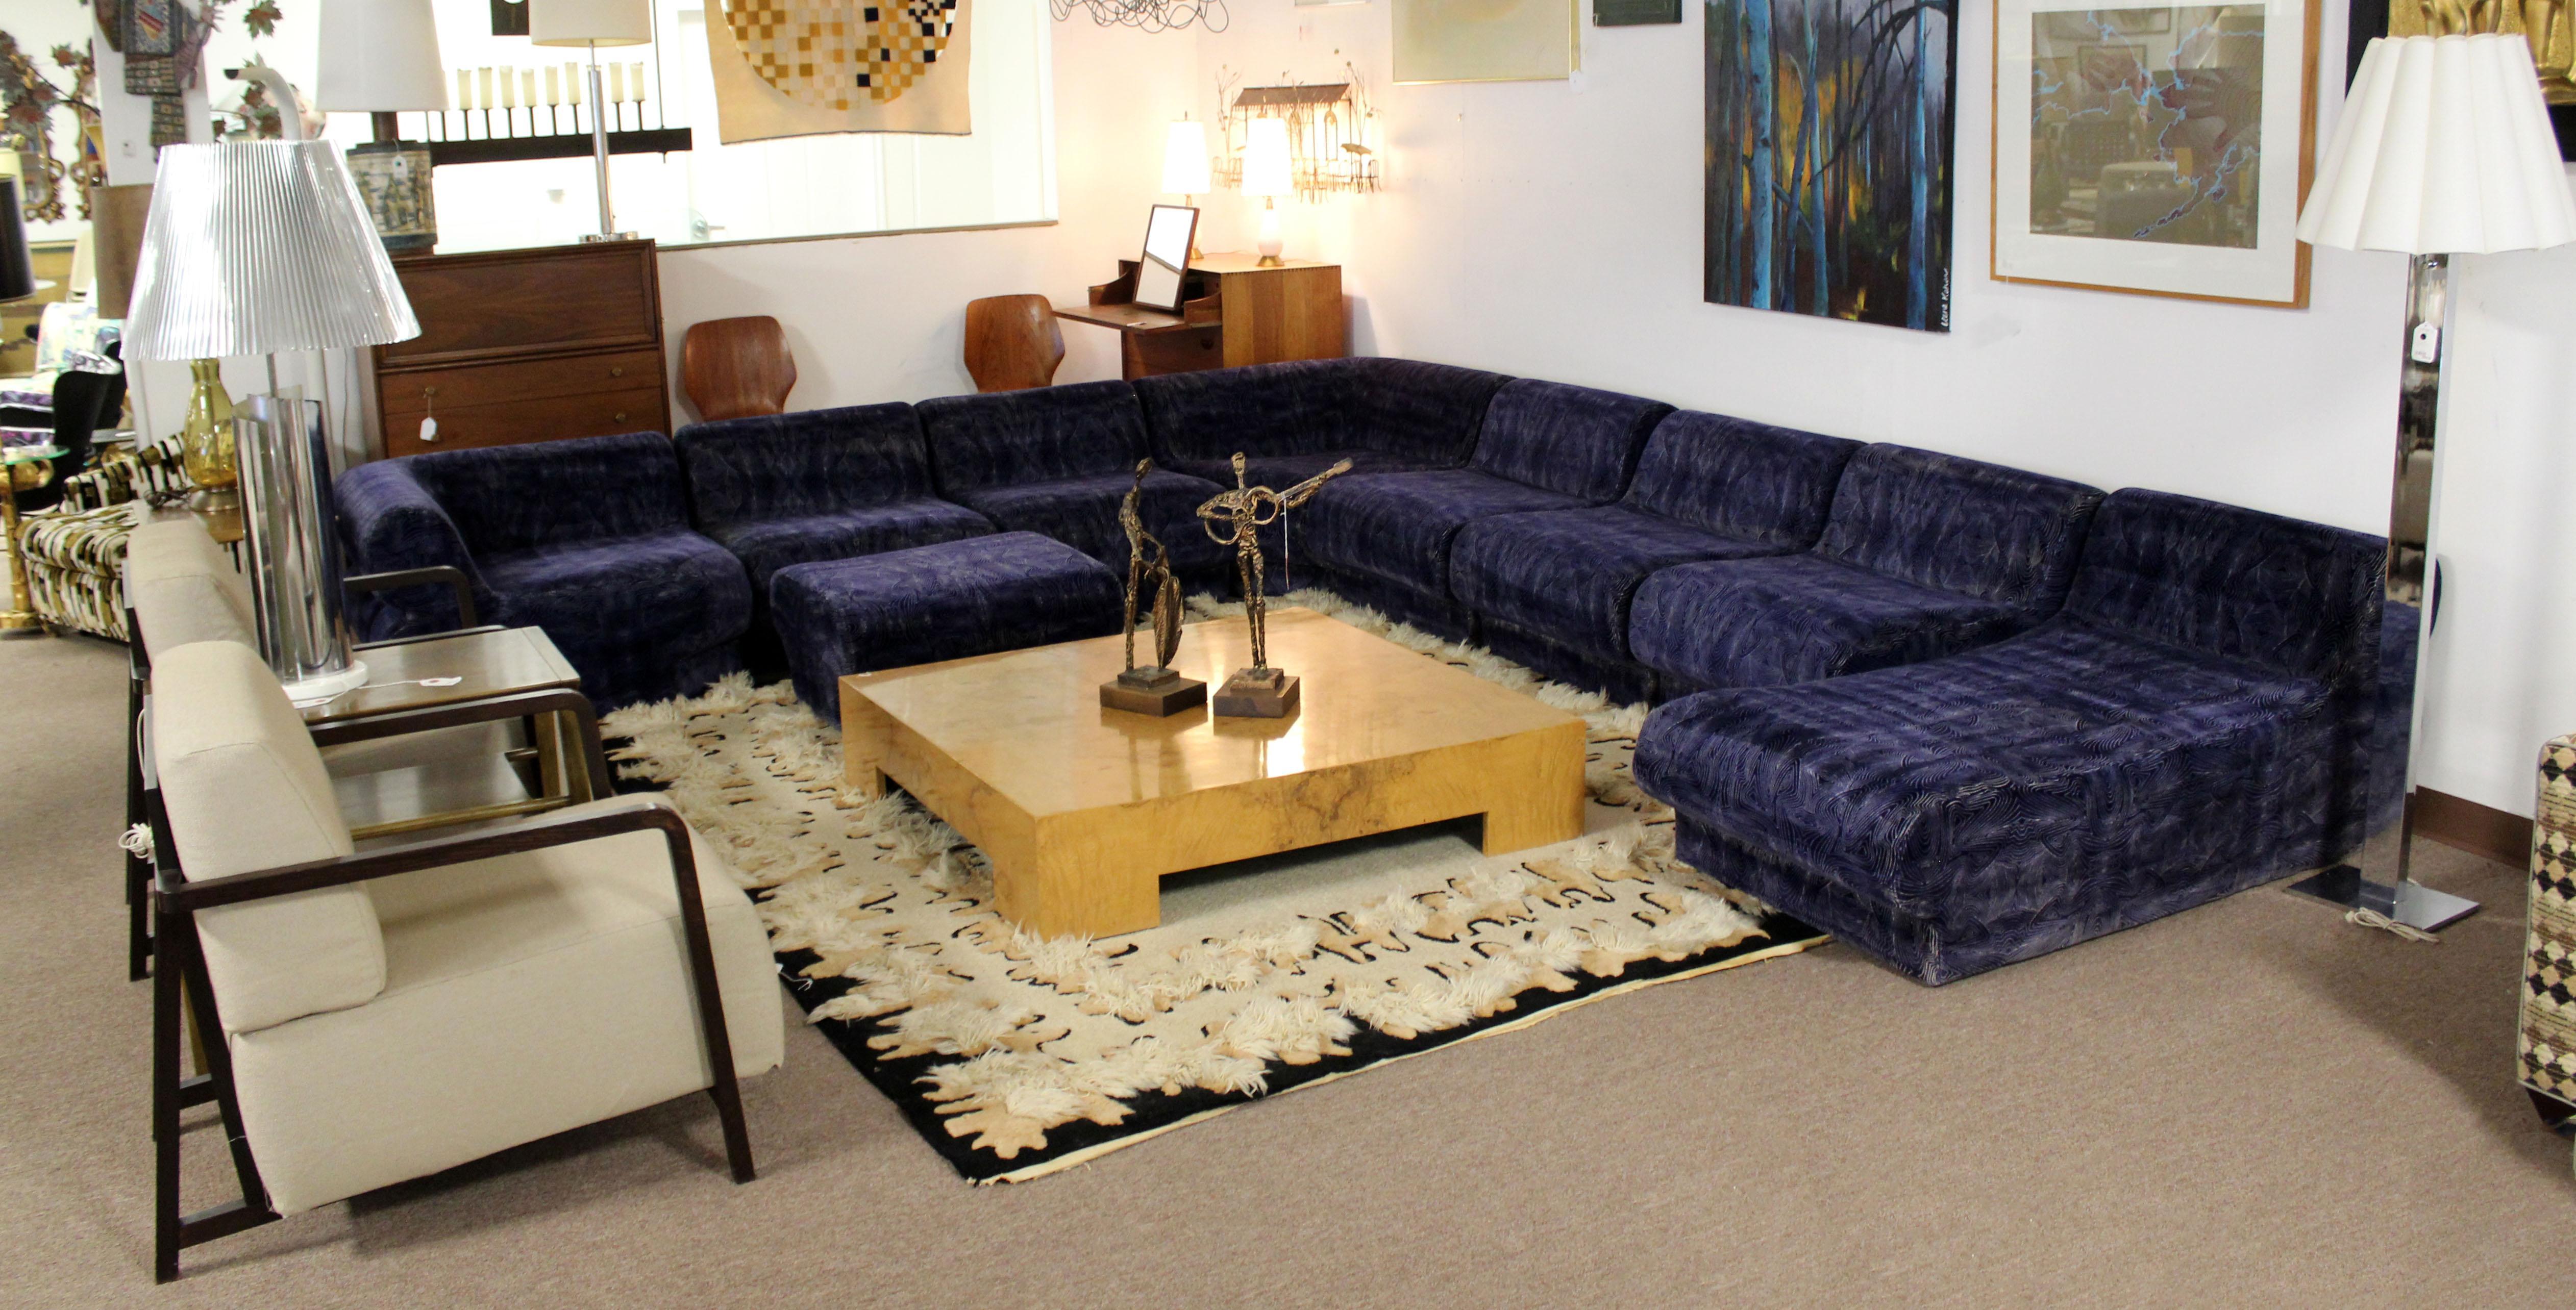 Surprising Mid Century Modern 9 Piece Modular Serpentine Preview Blue Velvet Sectional Sofa Ibusinesslaw Wood Chair Design Ideas Ibusinesslaworg